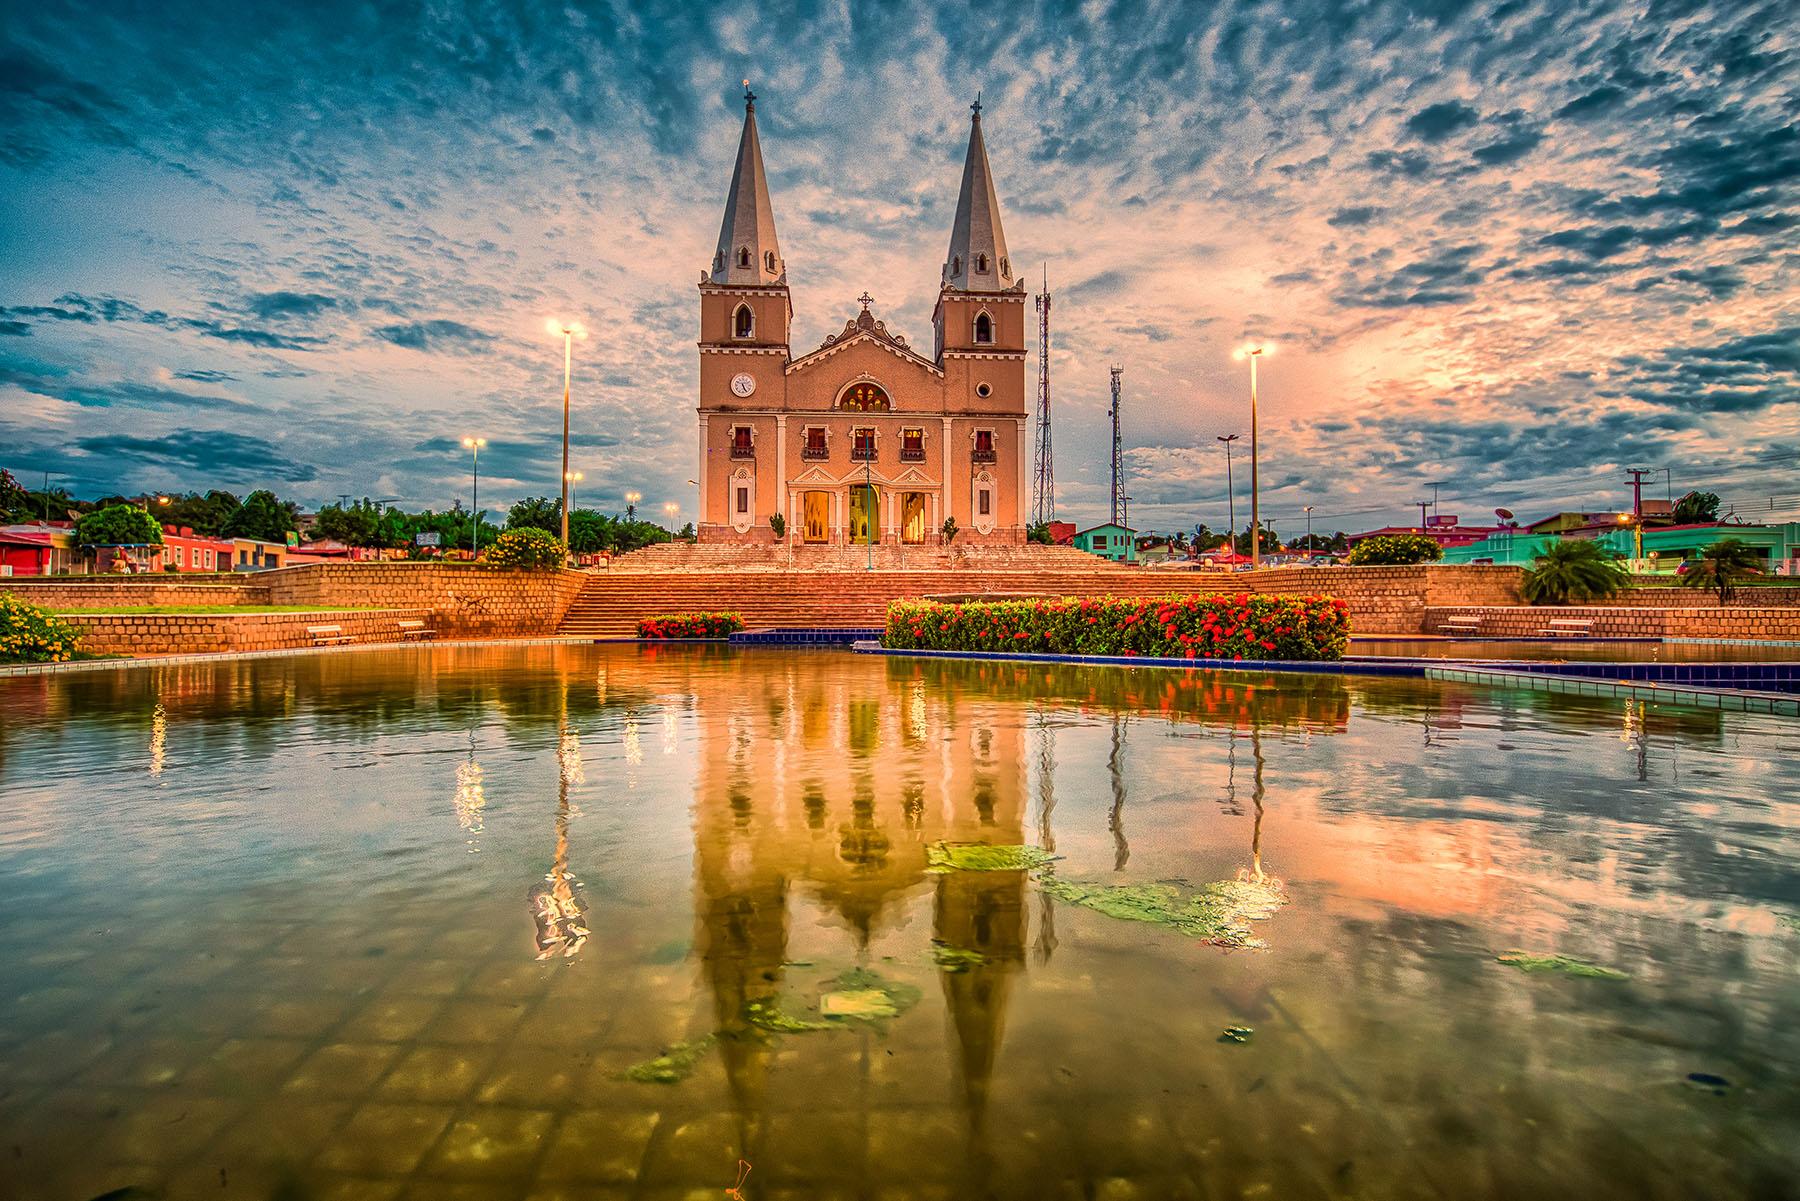 igreja_matriz_de_ceara_mirim_rio_grande_do_norte